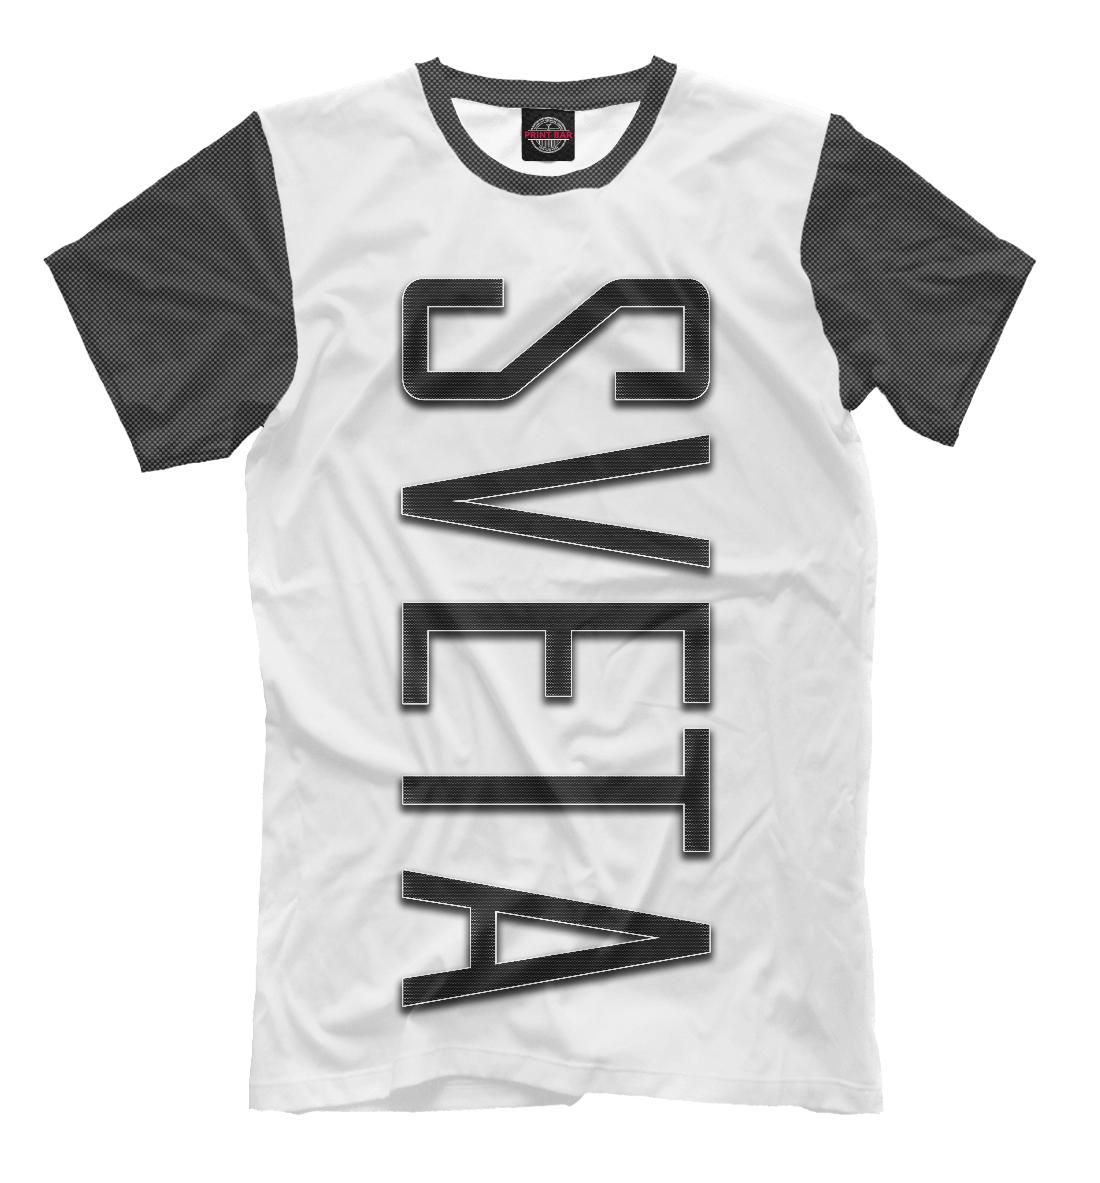 Купить Sveta-carbon, Printbar, Футболки, IMR-689896-fut-2